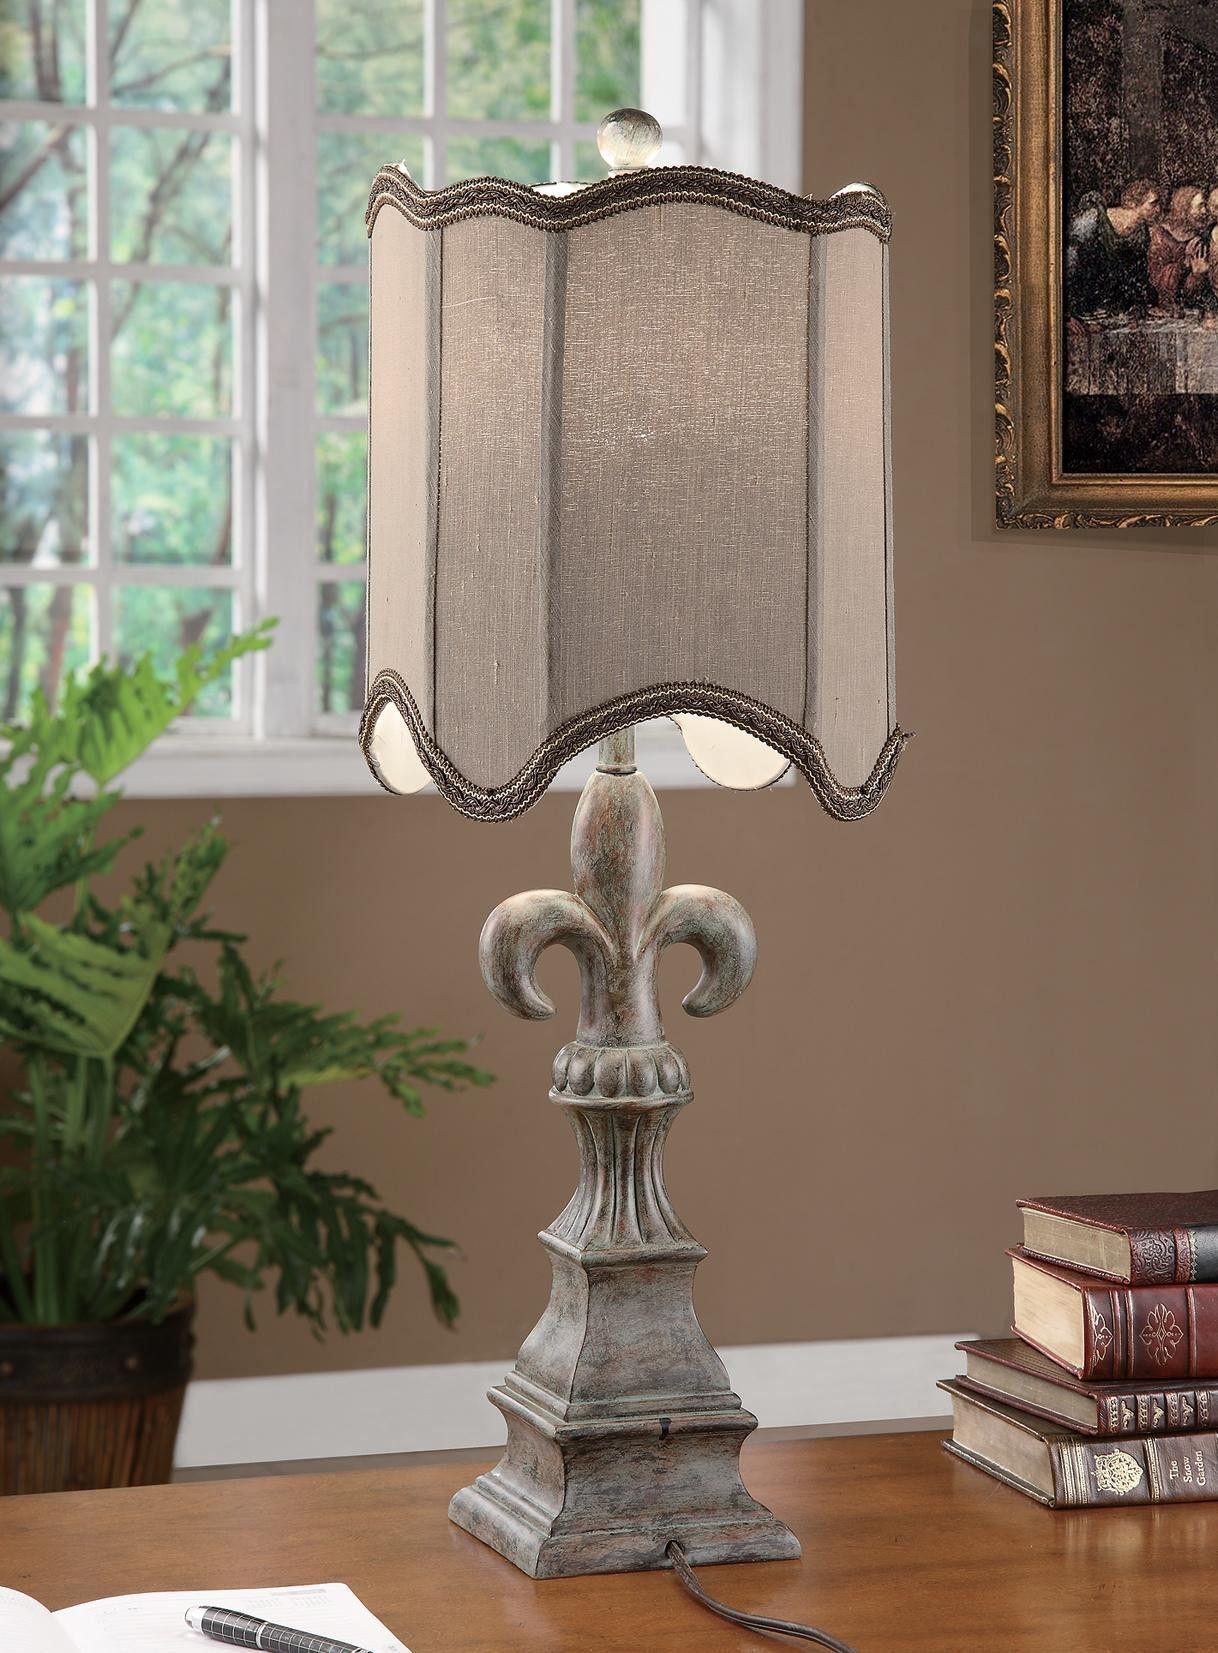 Tuscan Fleur De Lis Table Lamp Tuscan Fleur De Lis Table Lamp 29 Ht Resin Tuscan Grey Finish 10 10x10 10x12 75 Mushroom Silk Shade Lamp Table Lamp Home Decor